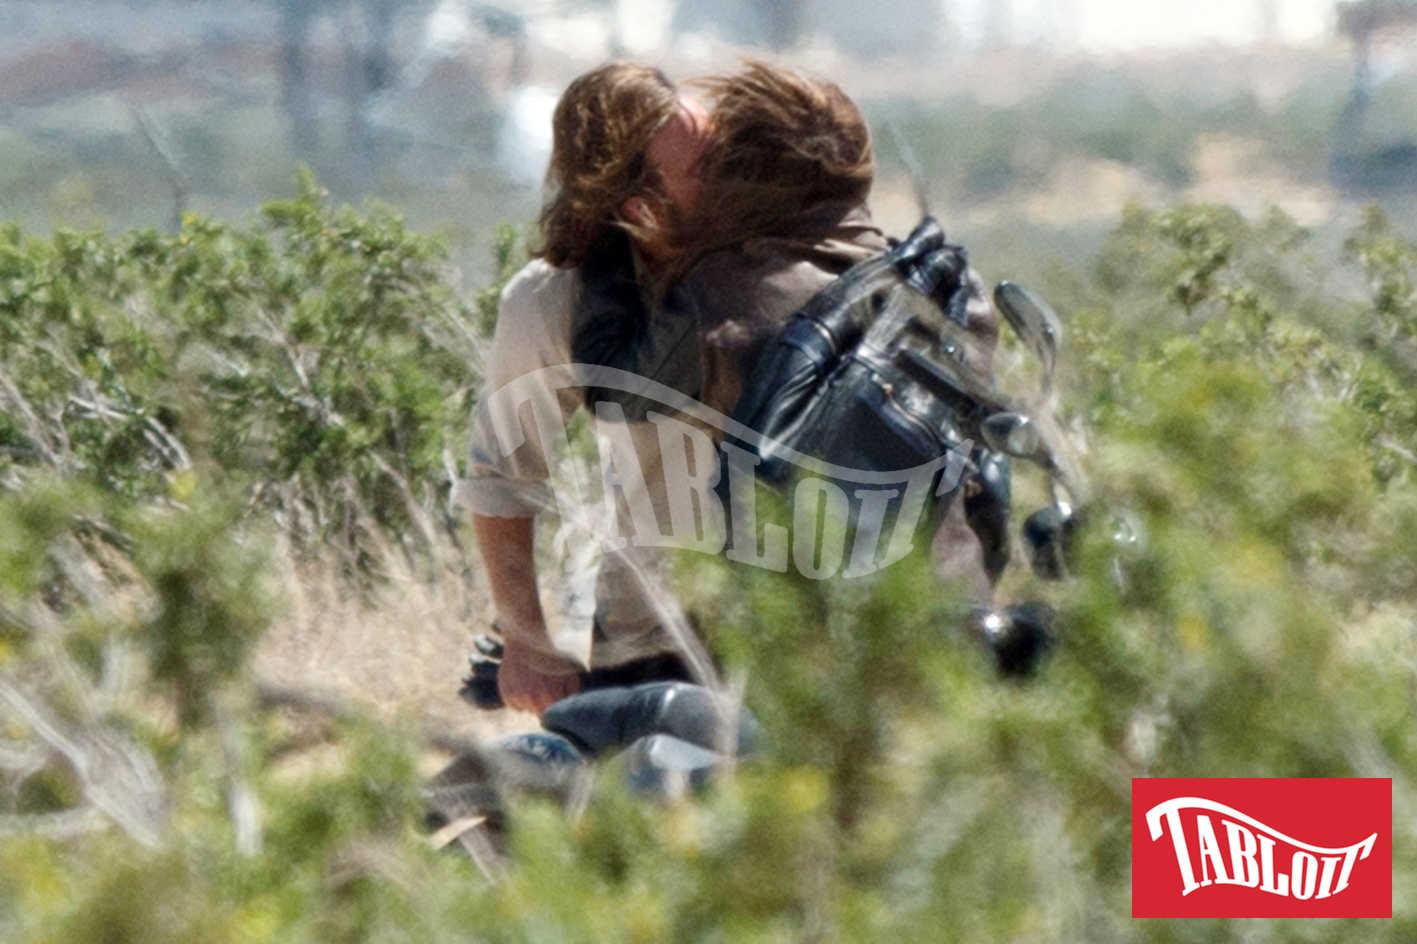 bacio bradley cooper e lady gaga